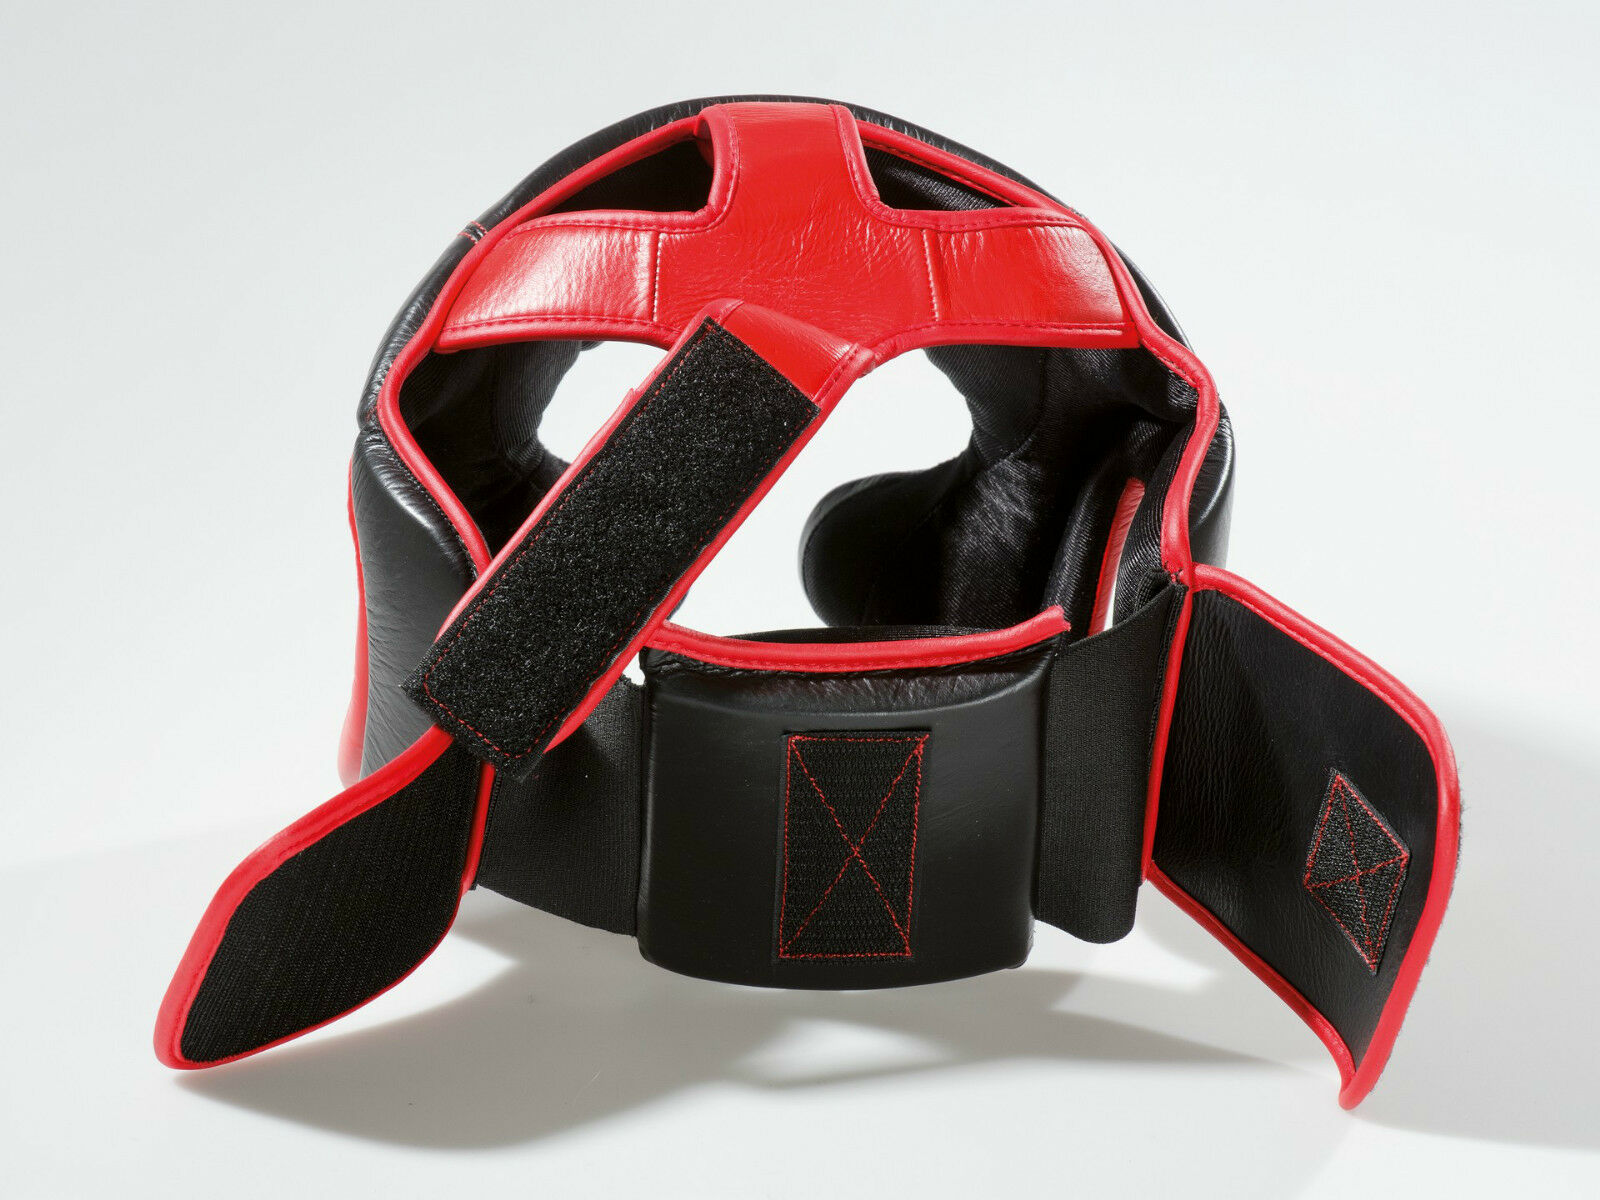 Kwon-  Kopfschutz Professional Kwon Professional Kopfschutz Boxing aus Leder. M-XL. perfekt anpassbar. a9e5ee